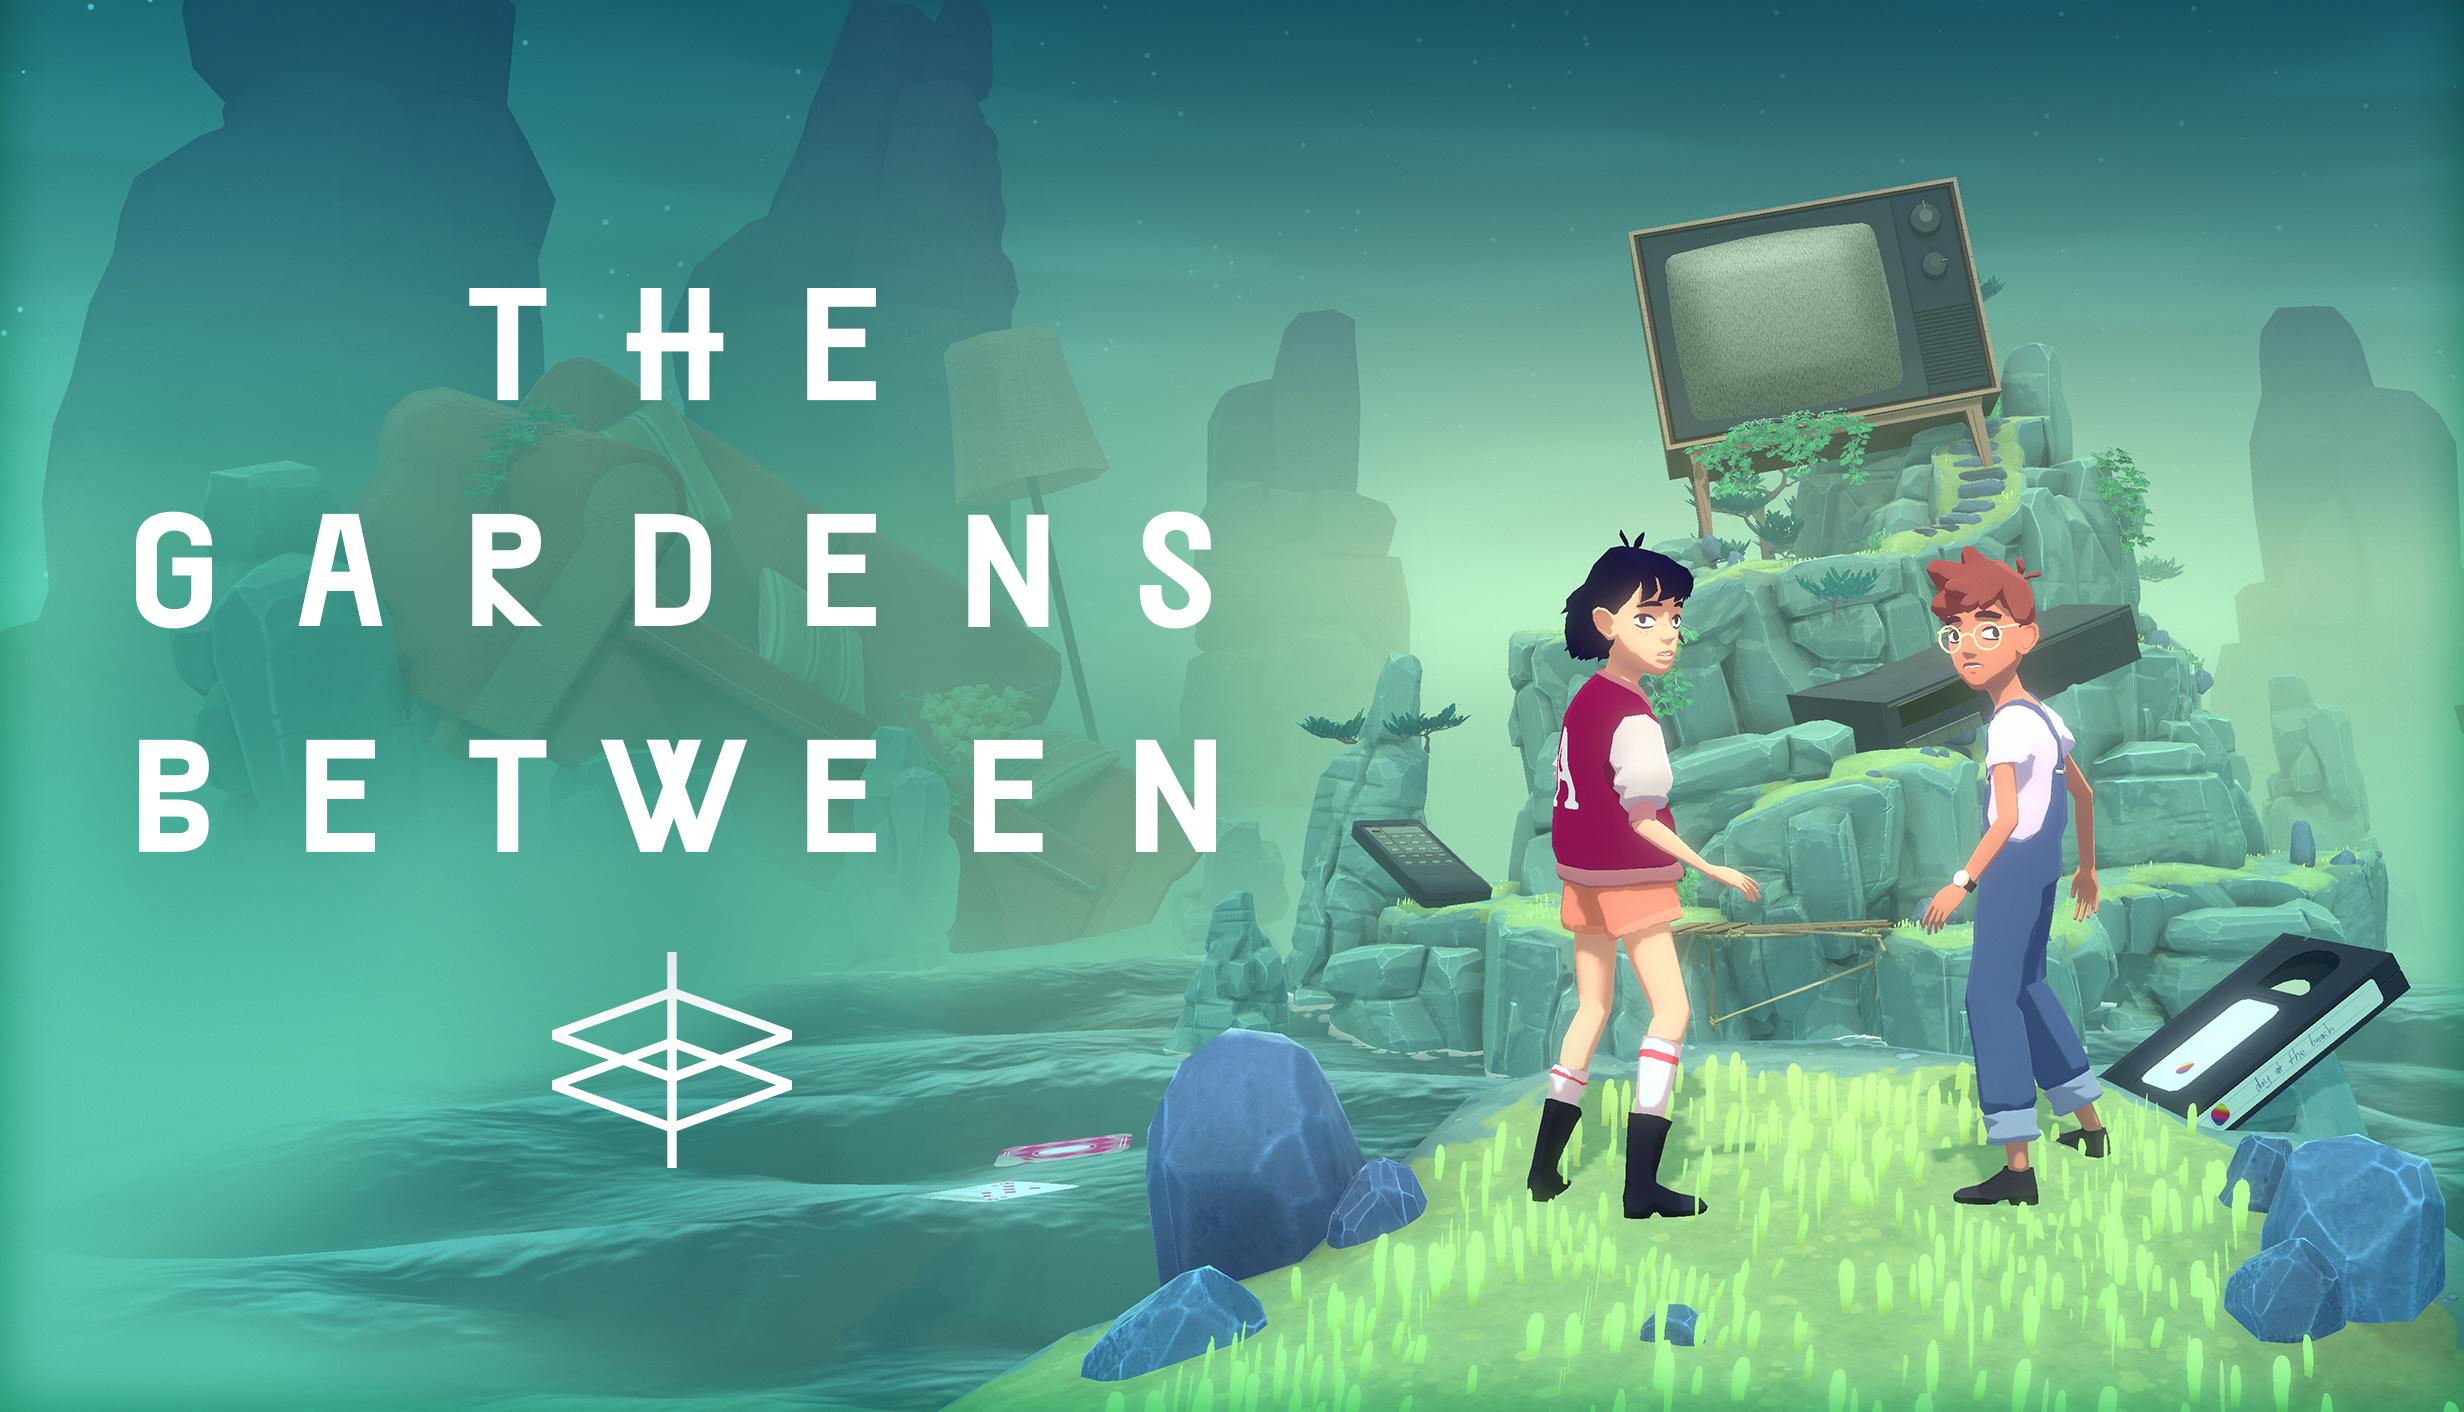 Packshot des Spiels The Gardens Between